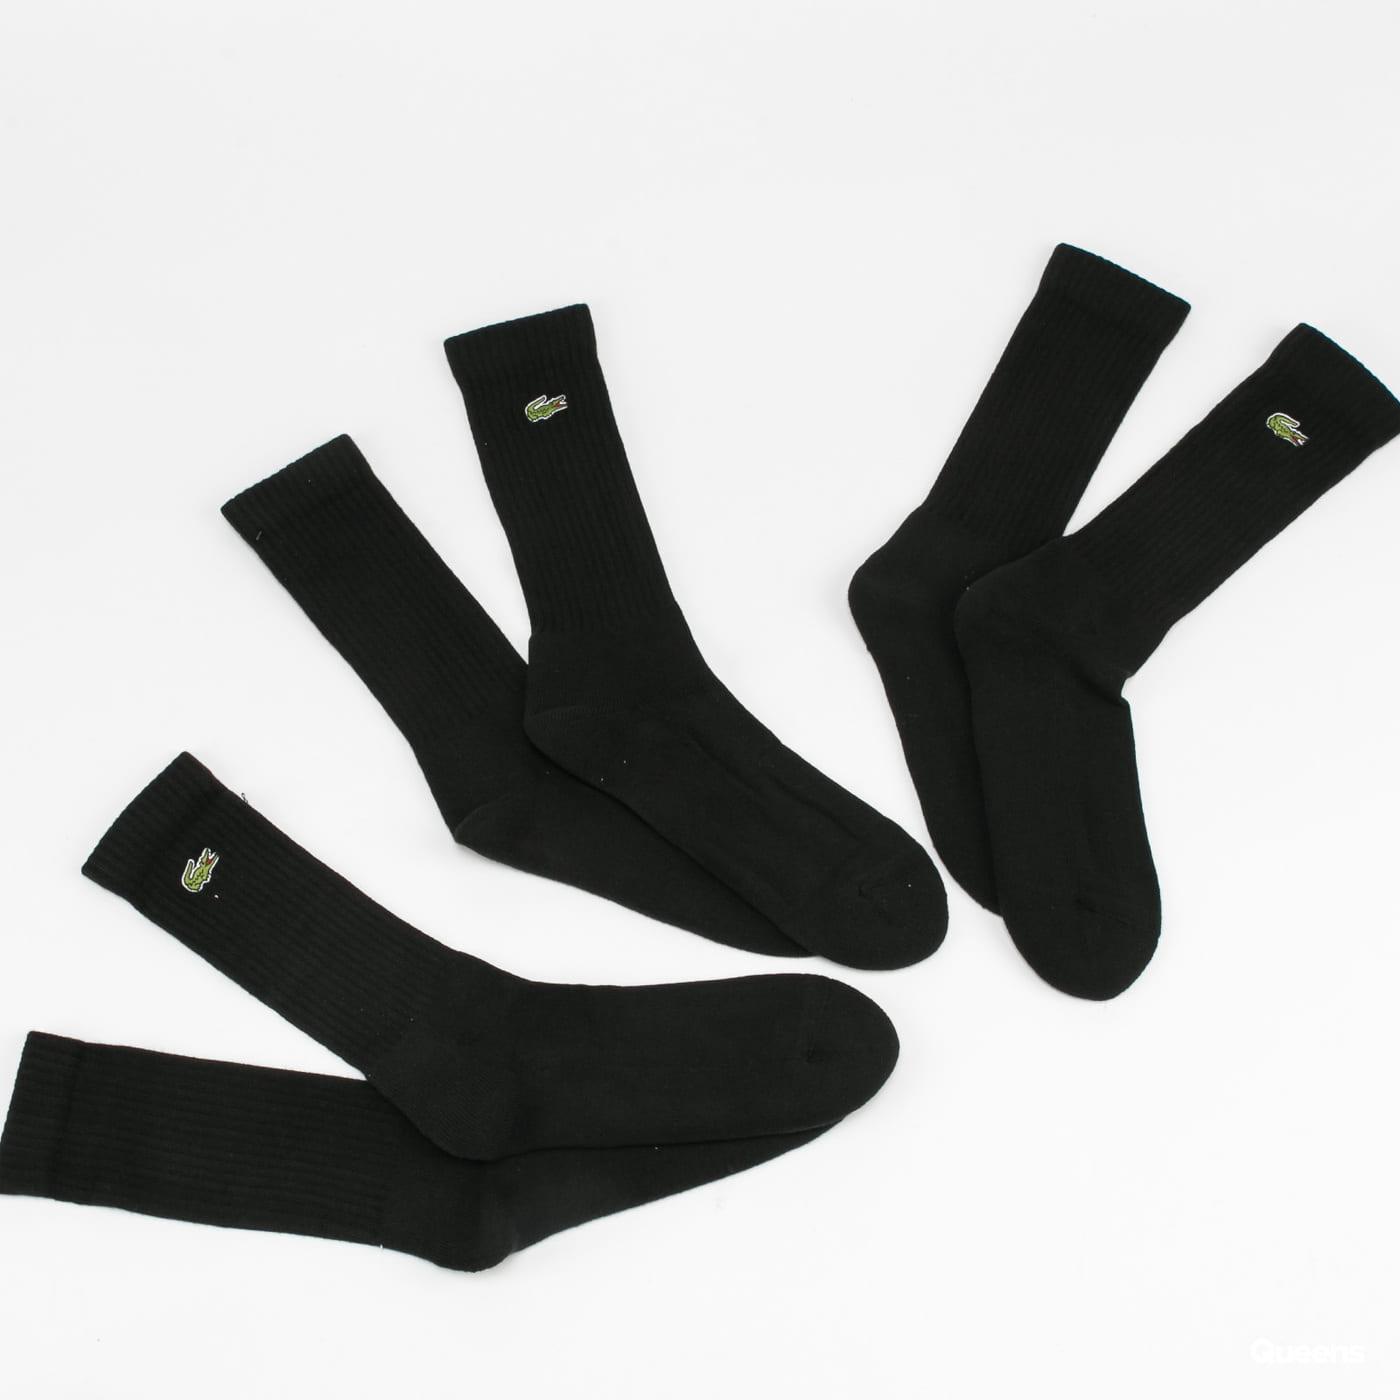 LACOSTE 3Pack Crew Cut Socks černé